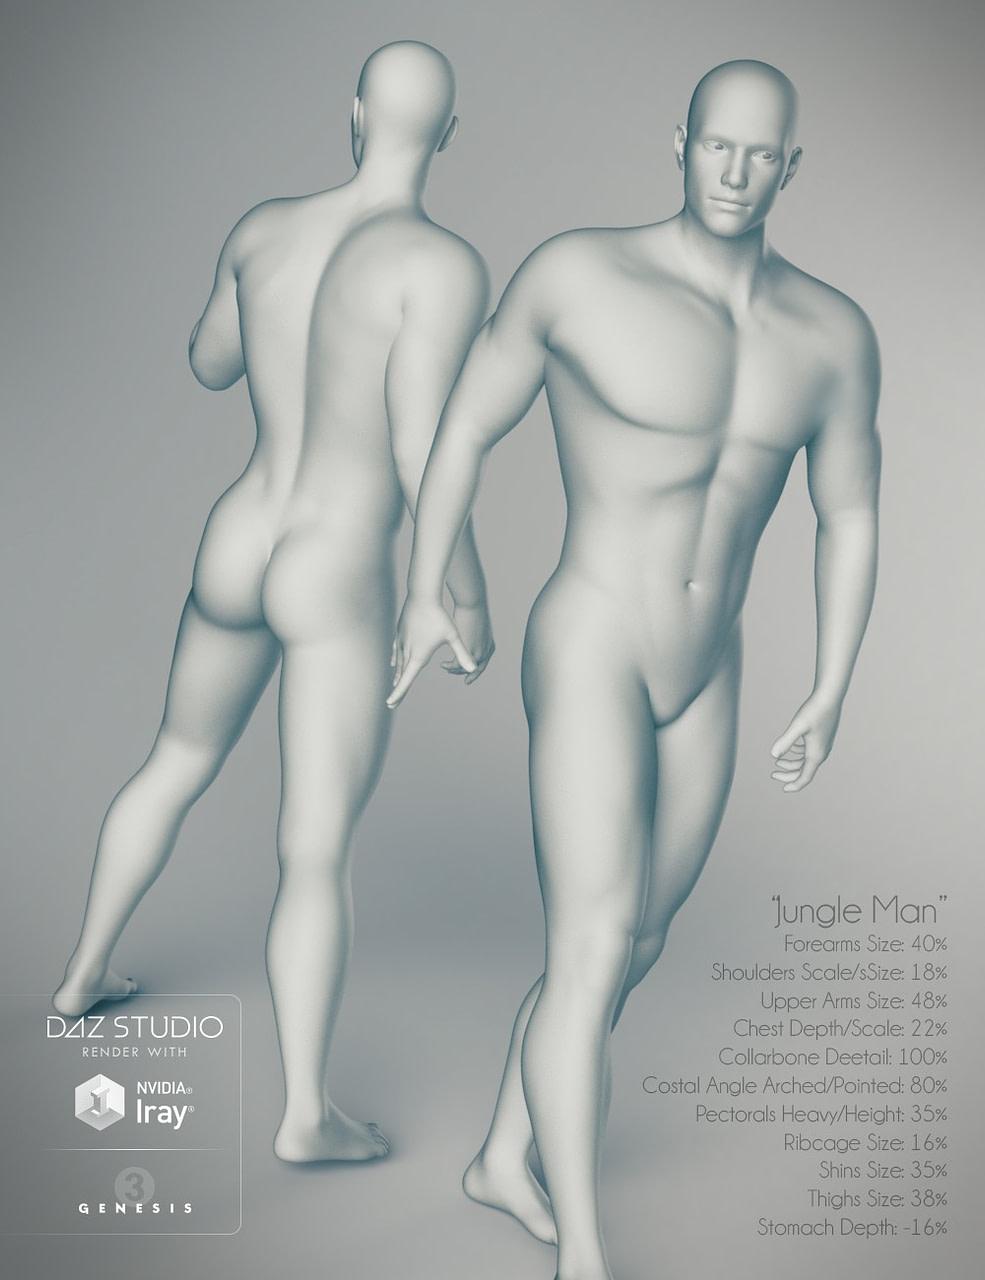 male body morphs for daz generation 3